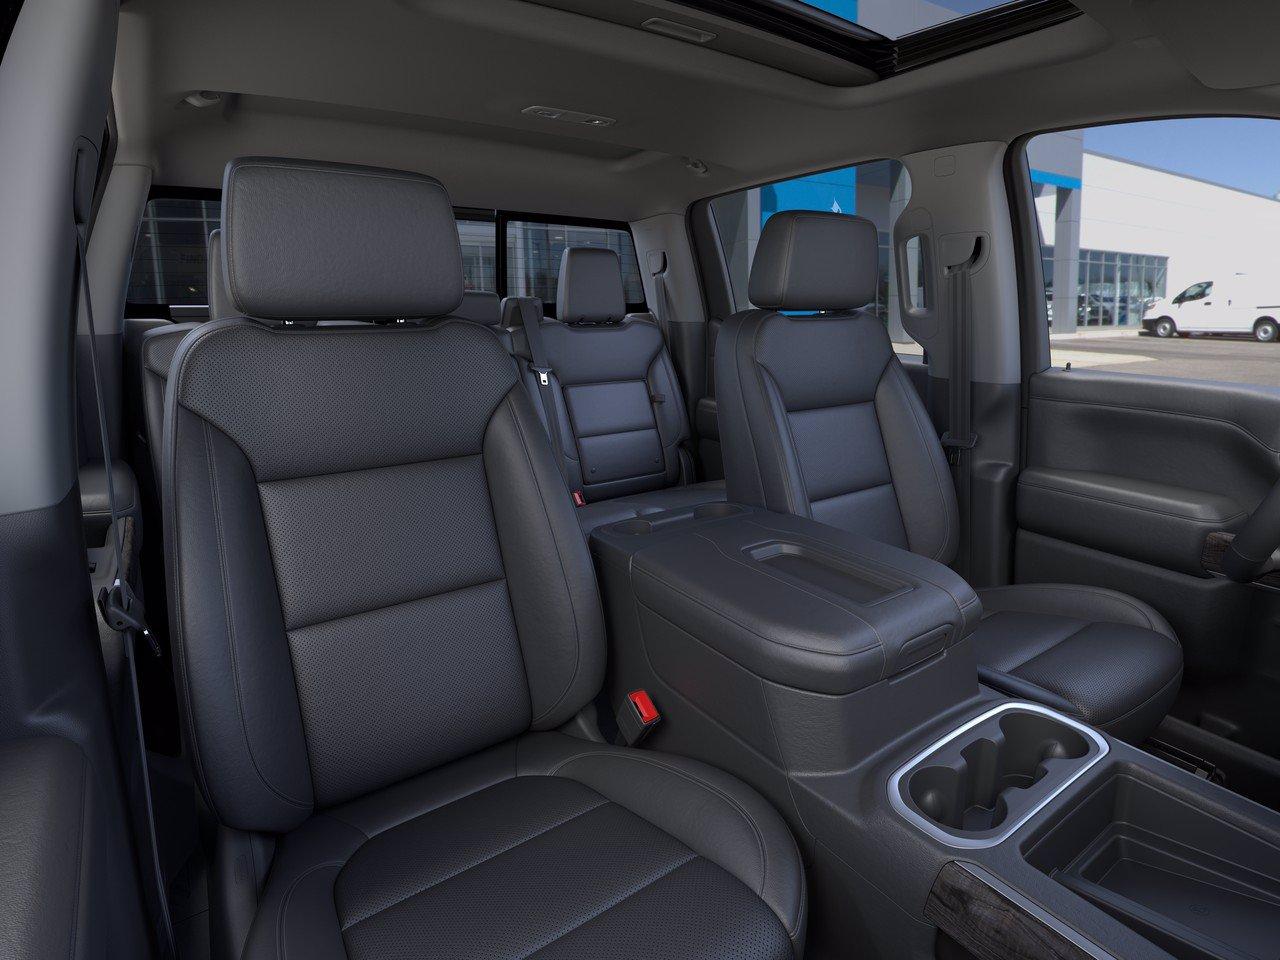 2020 Chevrolet Silverado 1500 Crew Cab 4x4, Pickup #C201707 - photo 11